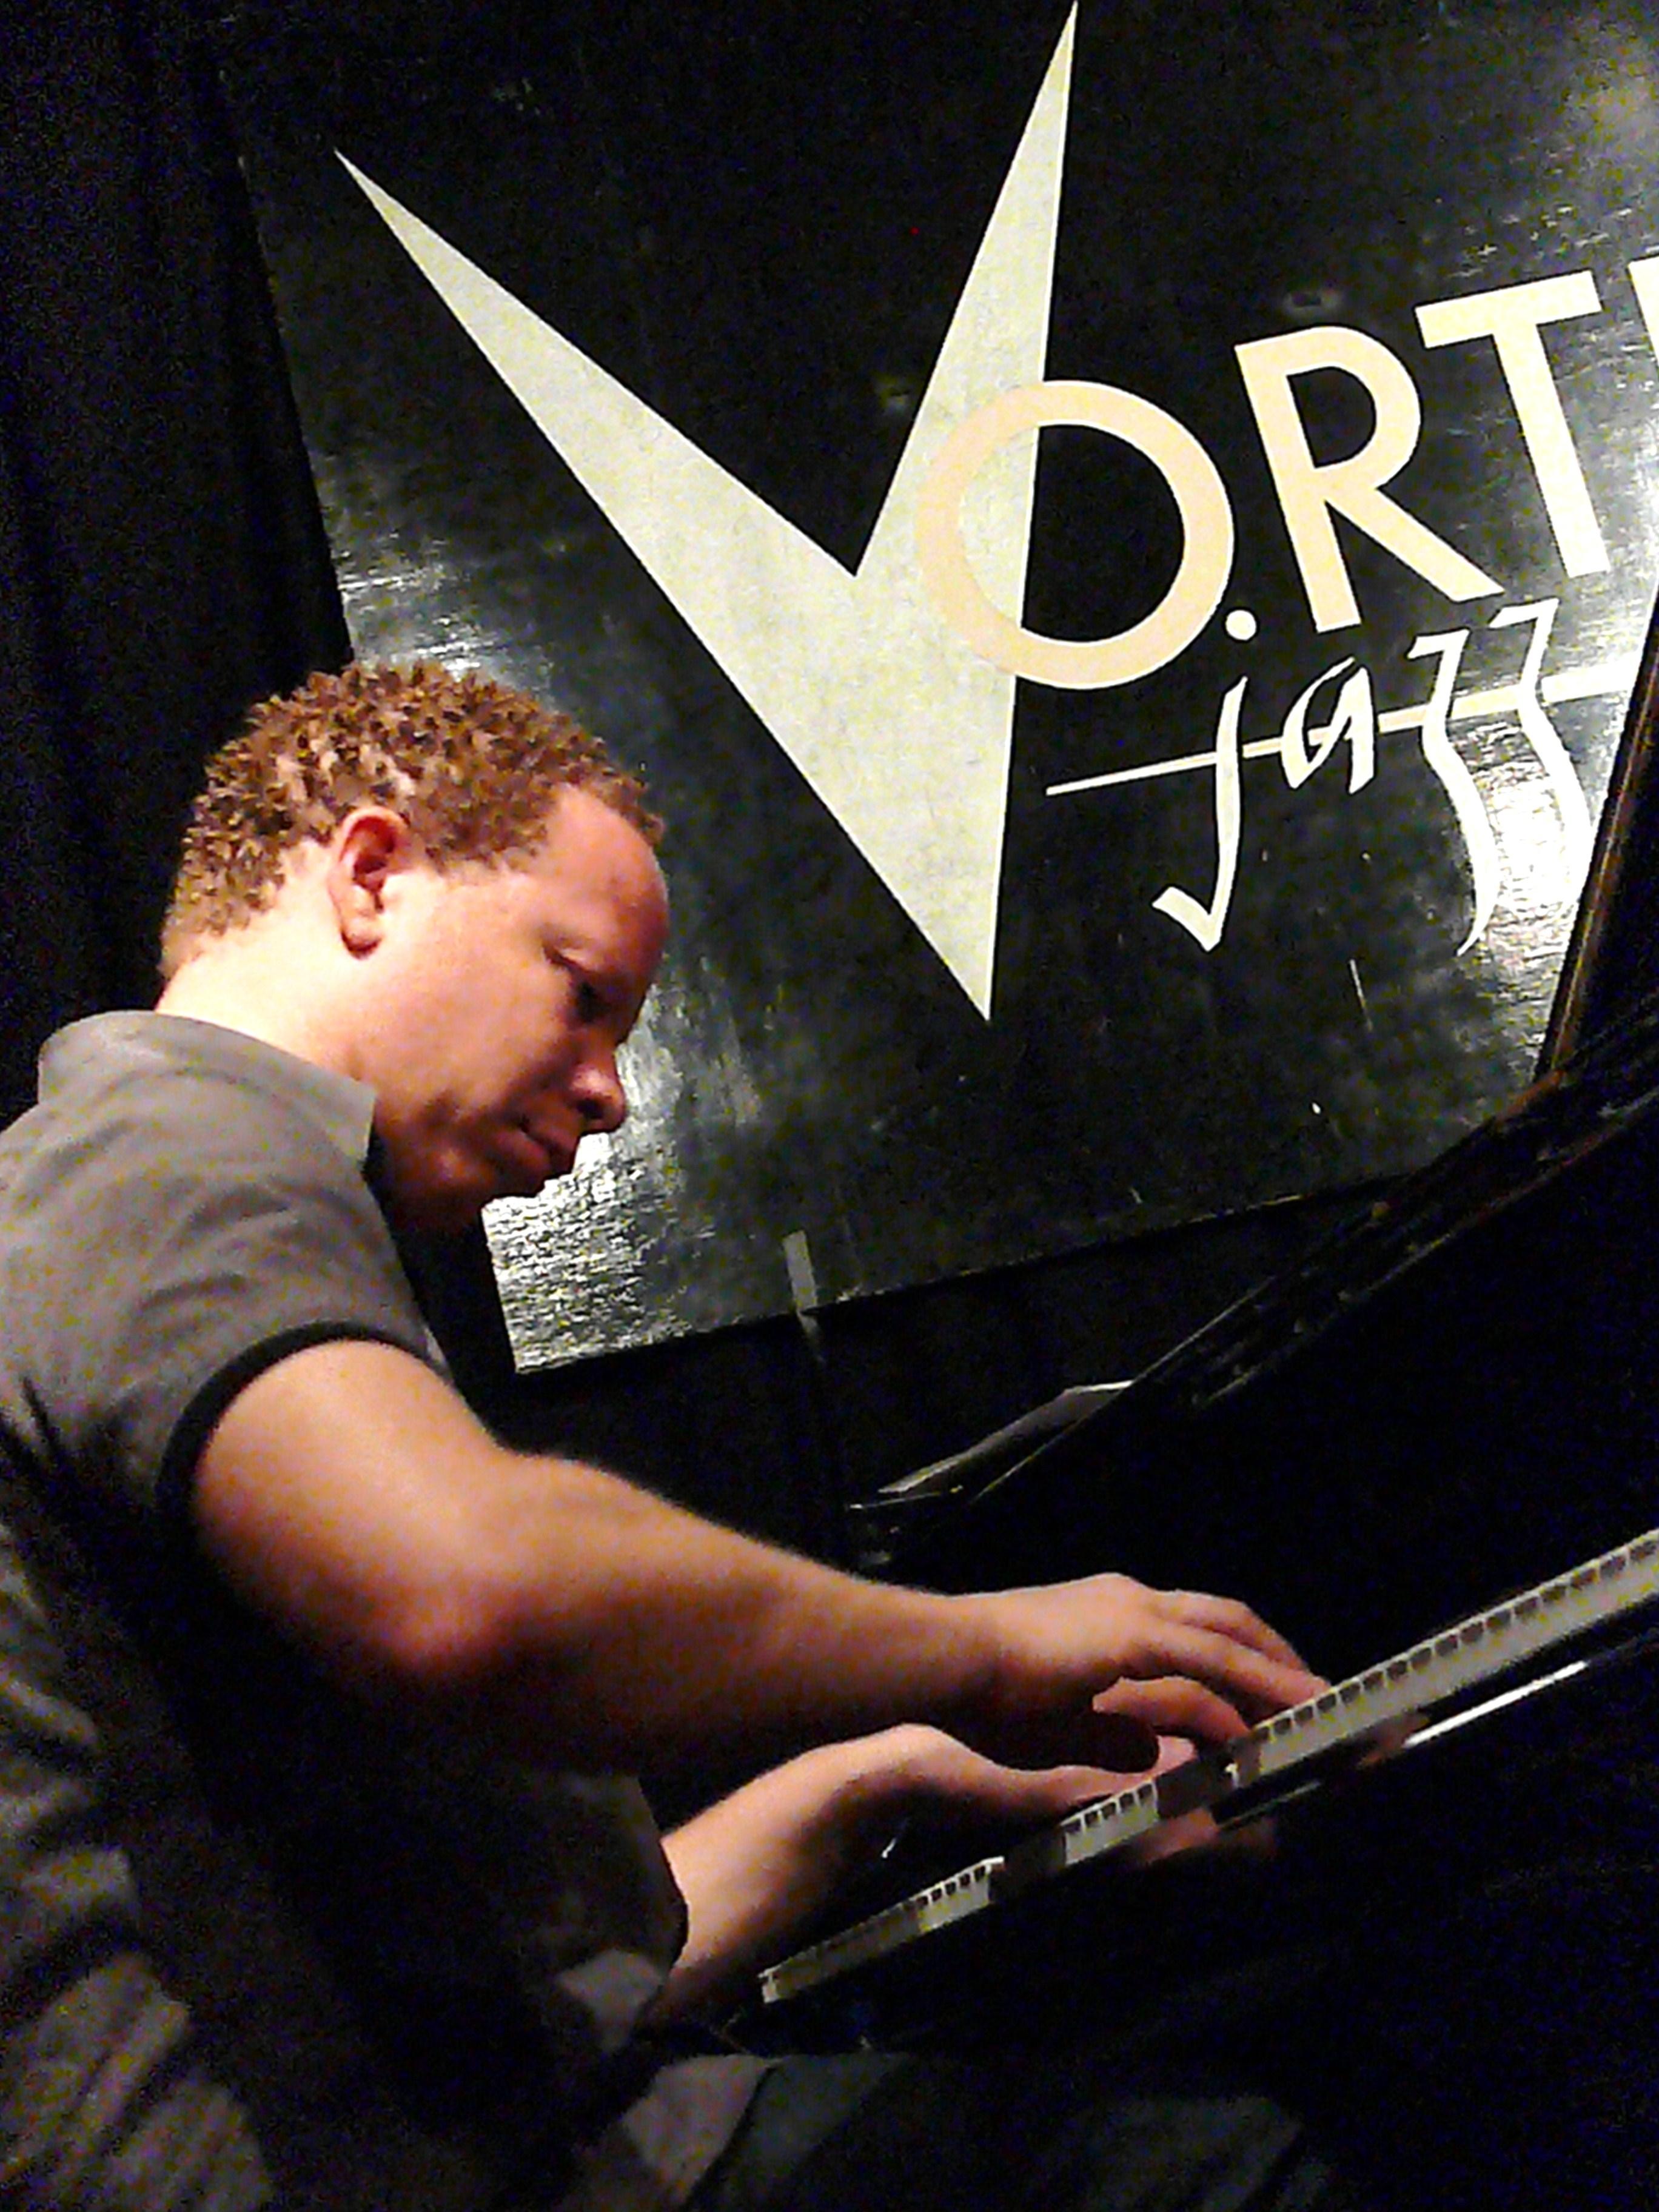 Craig Taborn at the Vortex, London on 25 May 2011